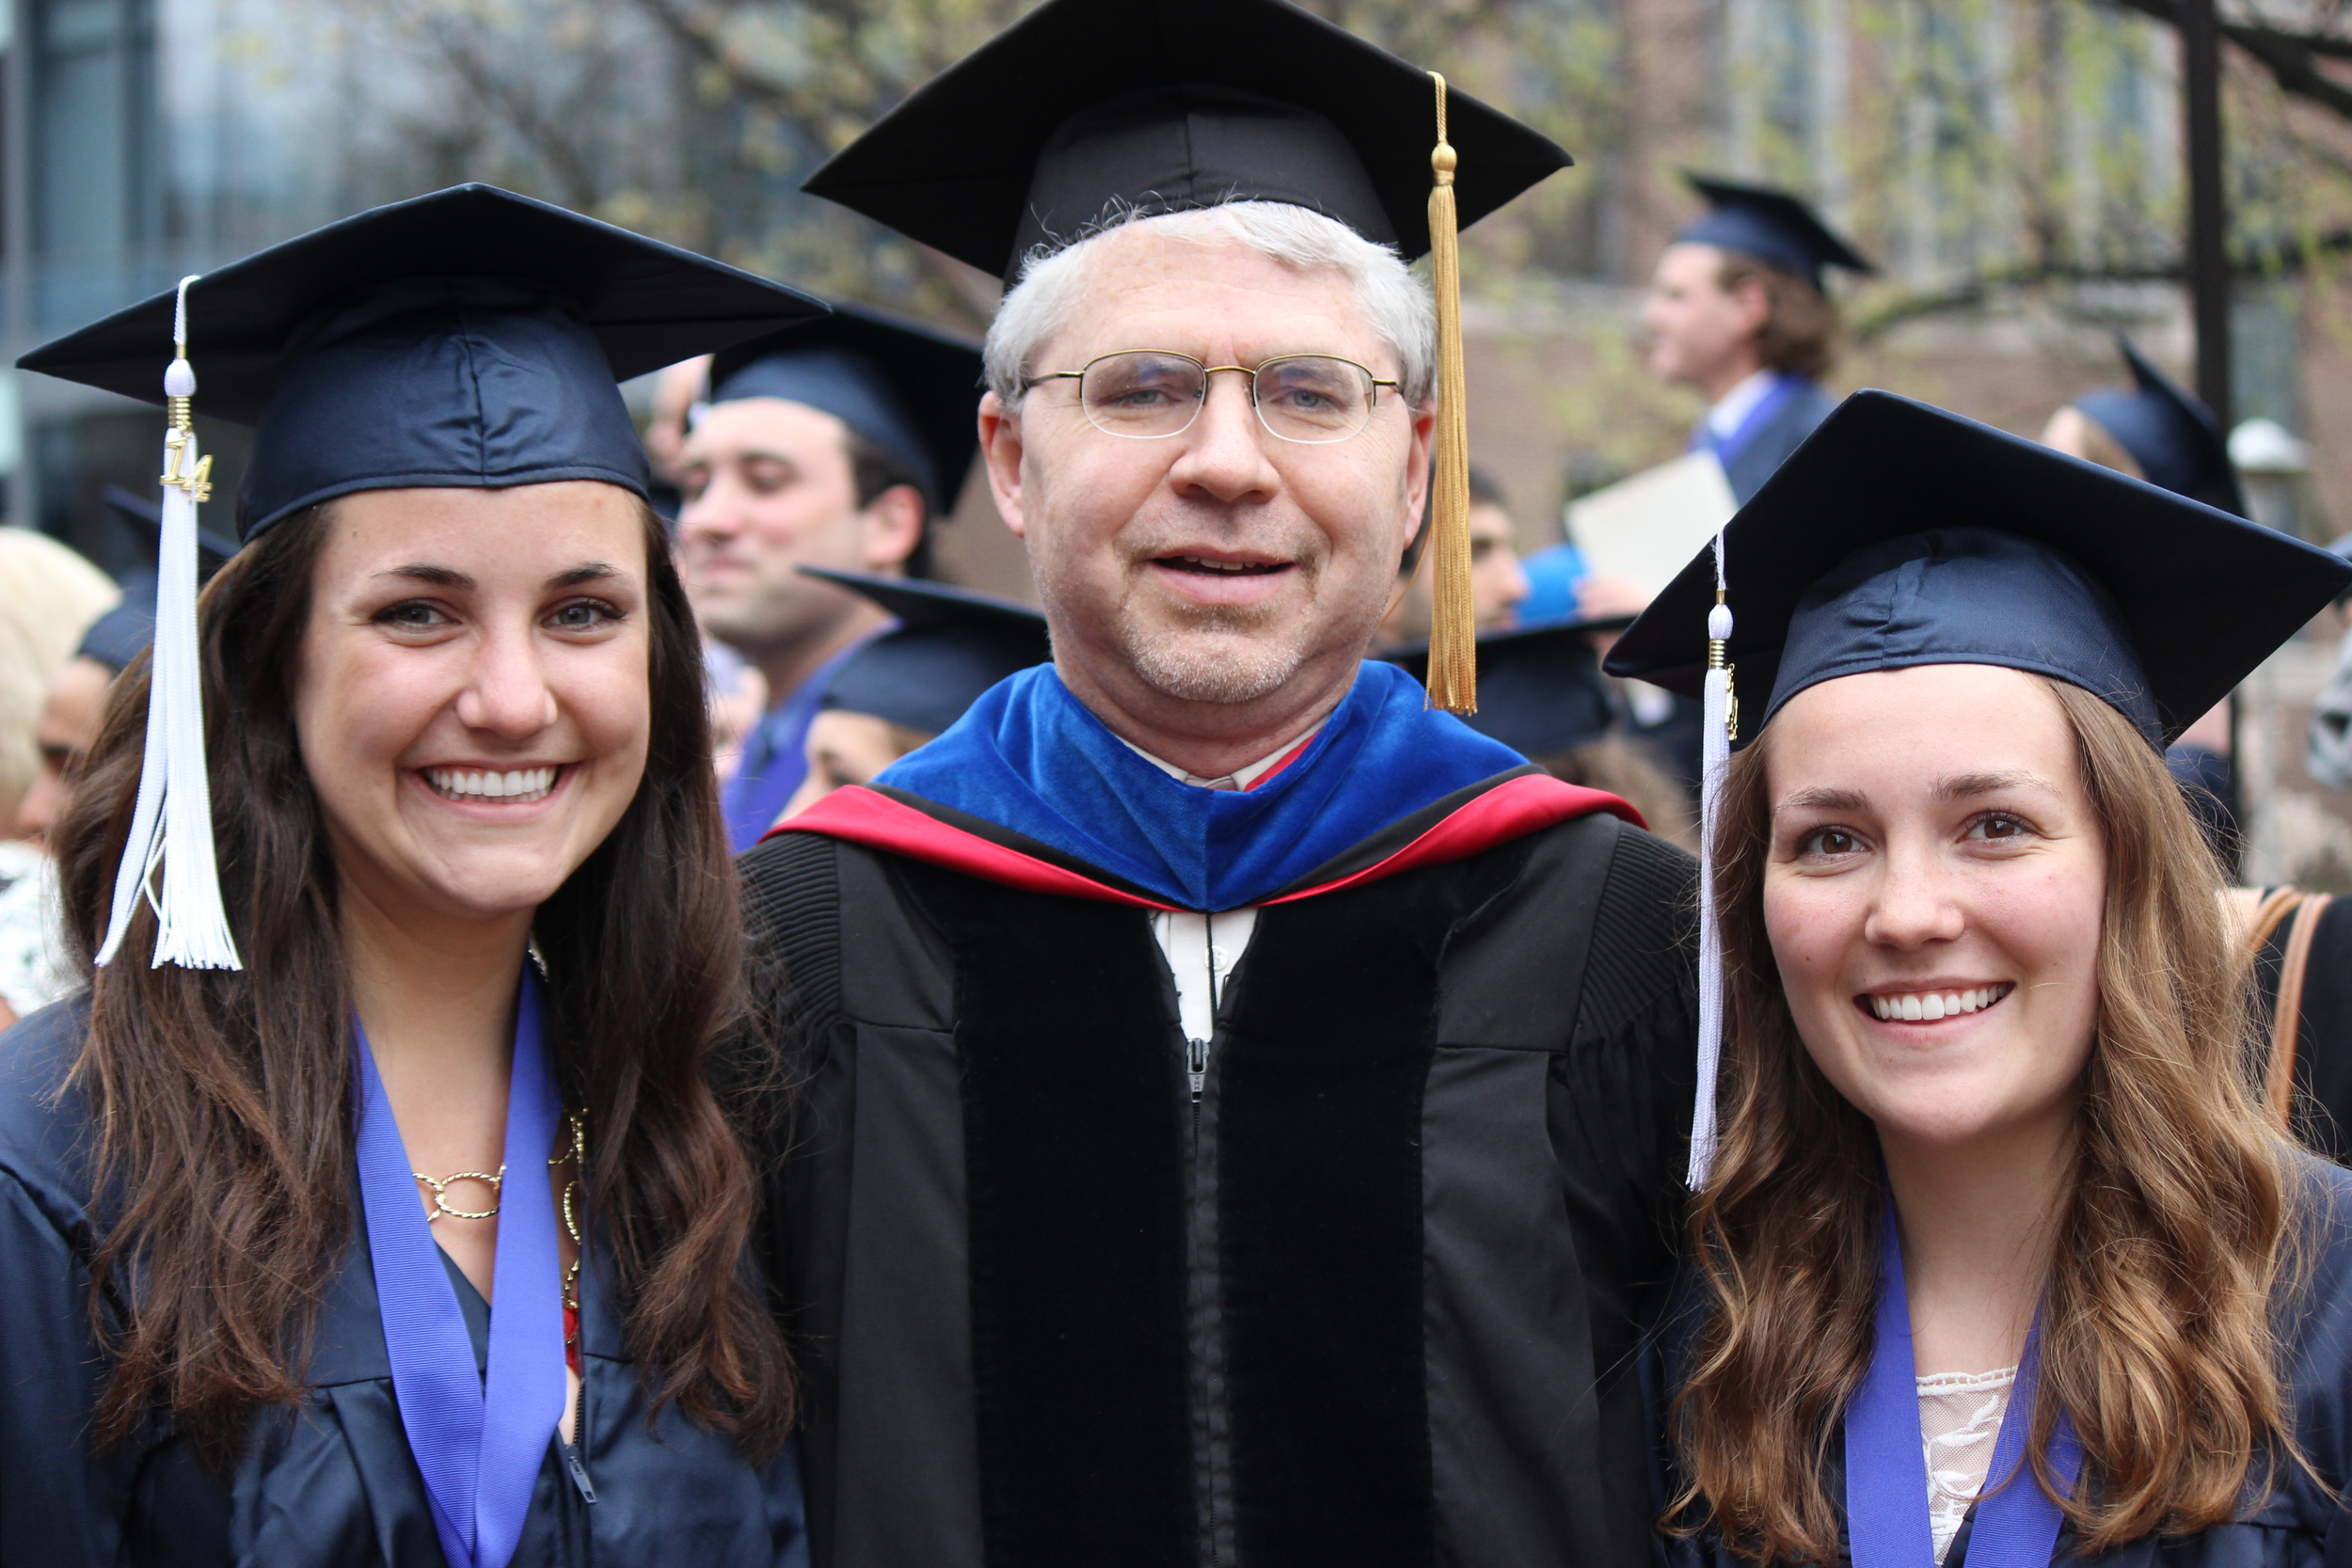 kathleen-briana-honors-graduation-2014.jpg